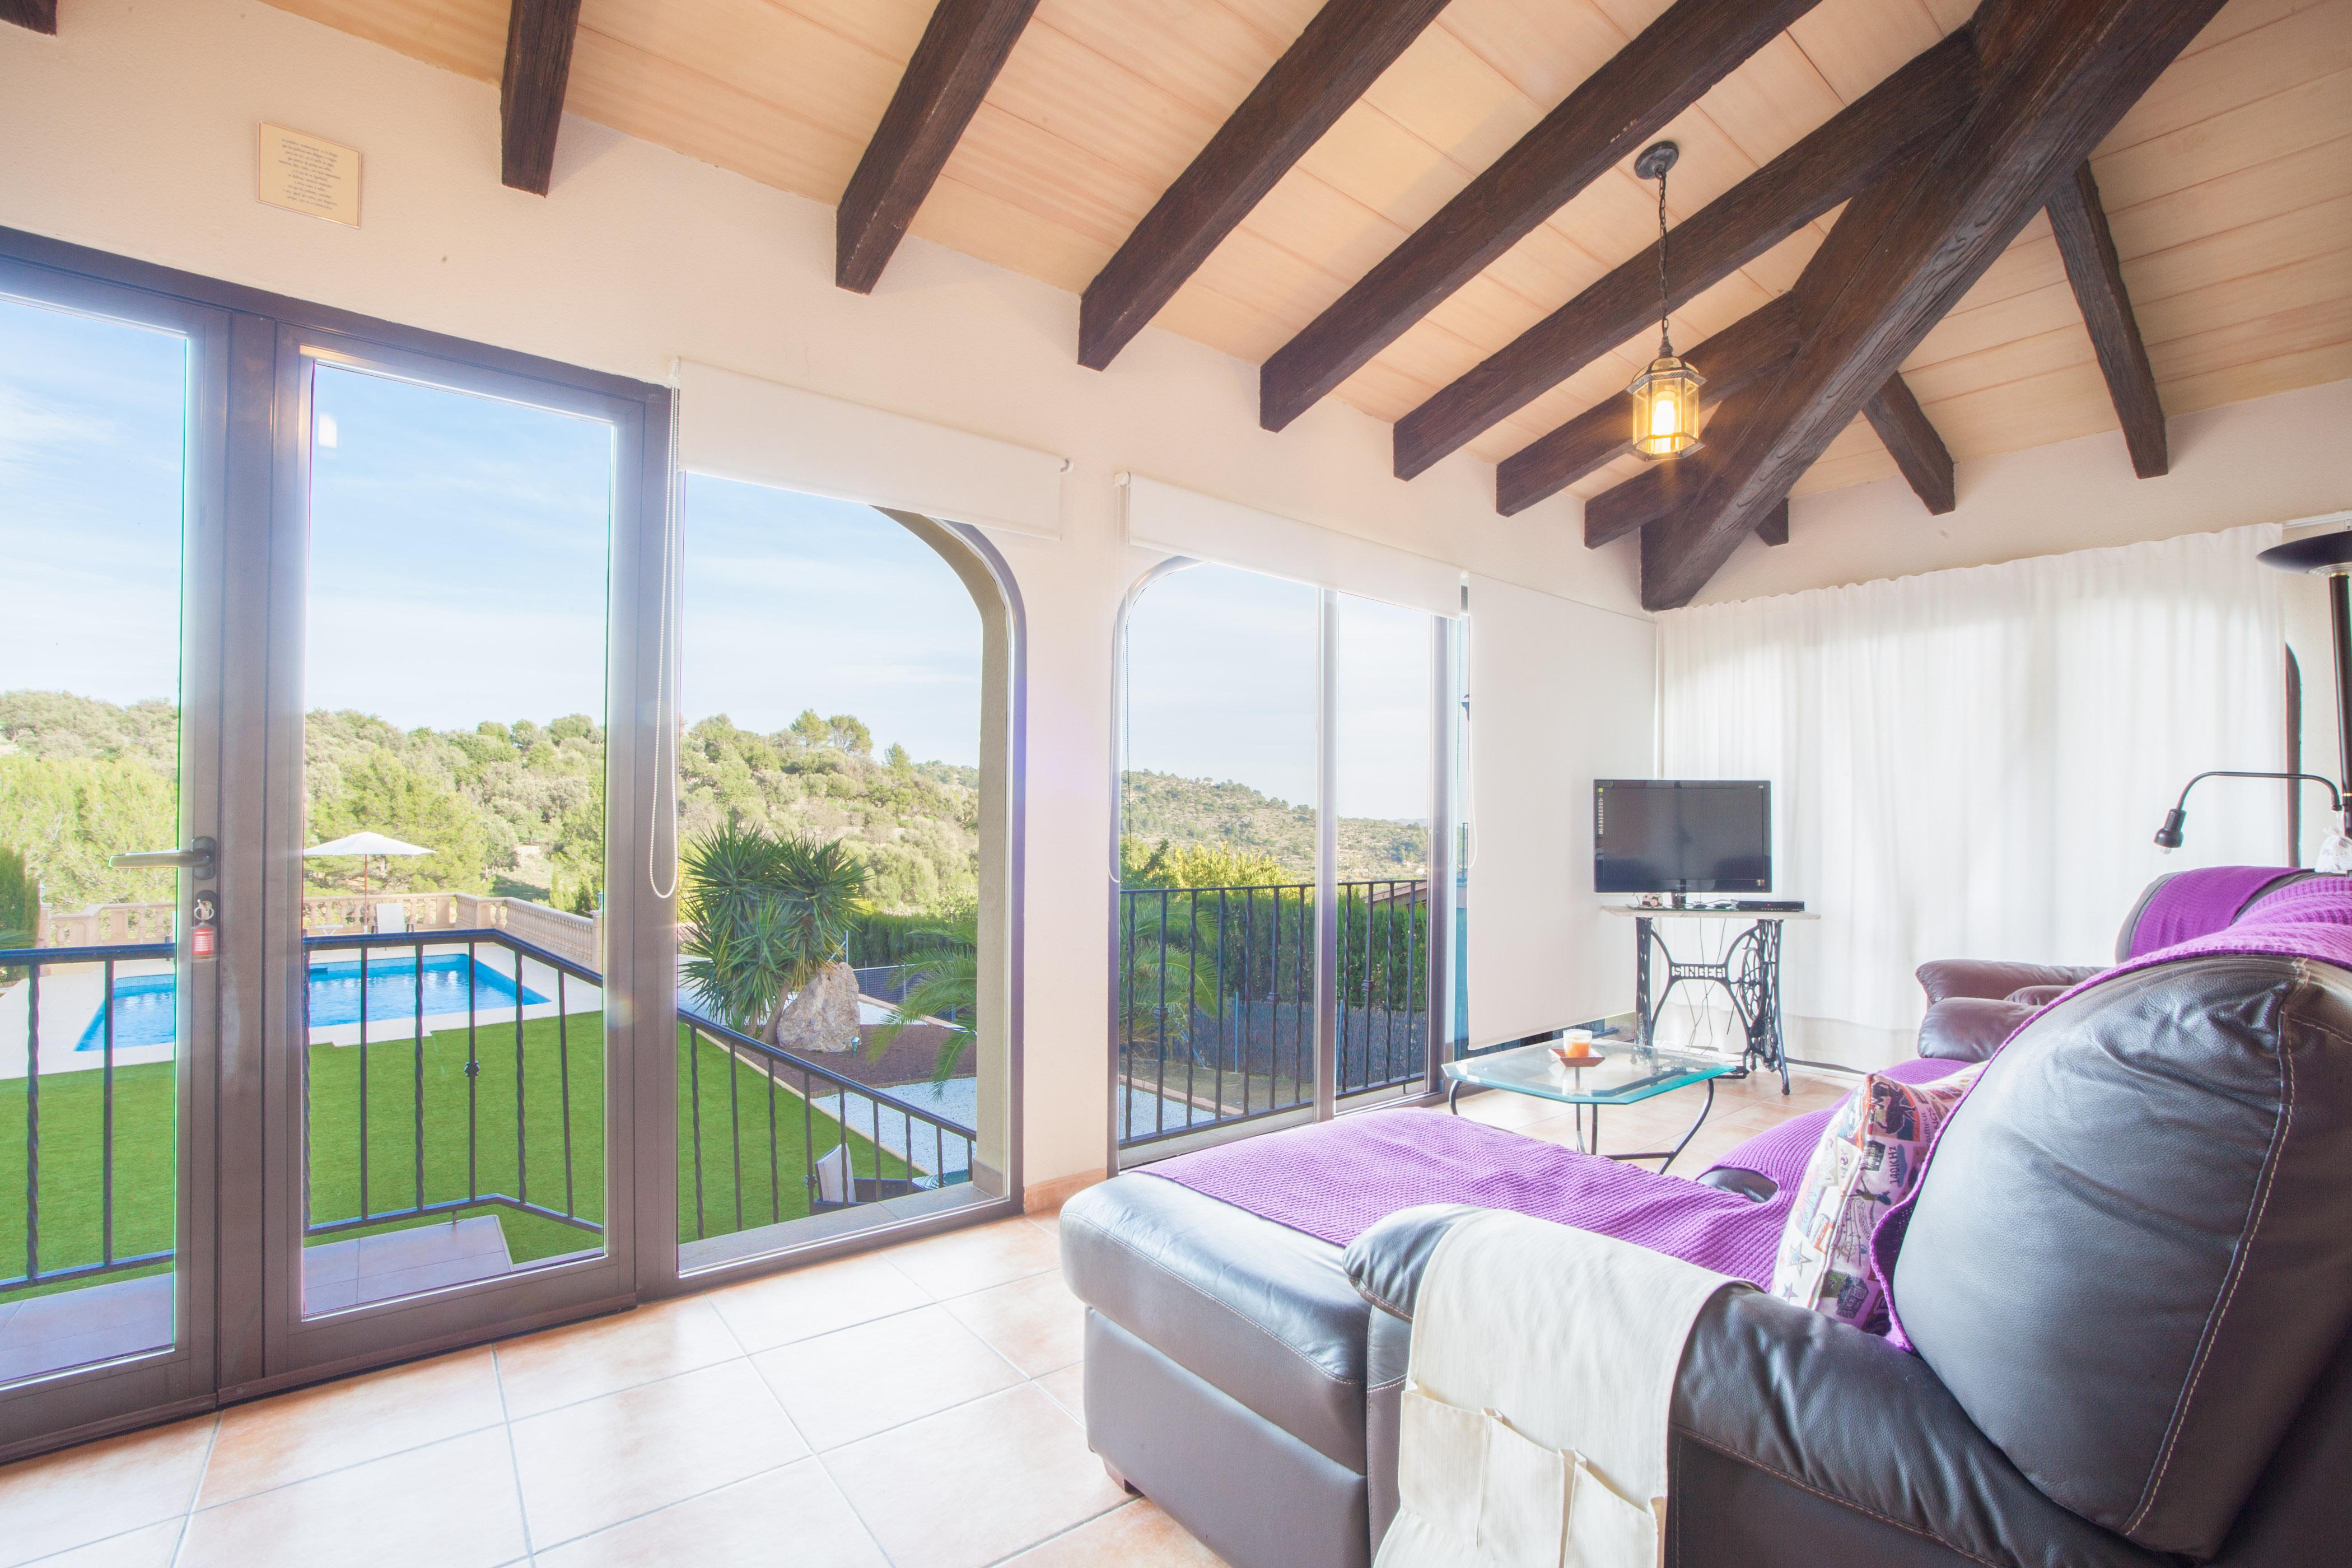 Ferienhaus SA TANCA (MANCORINA) (2037553), Mancor de la Vall, Mallorca, Balearische Inseln, Spanien, Bild 13